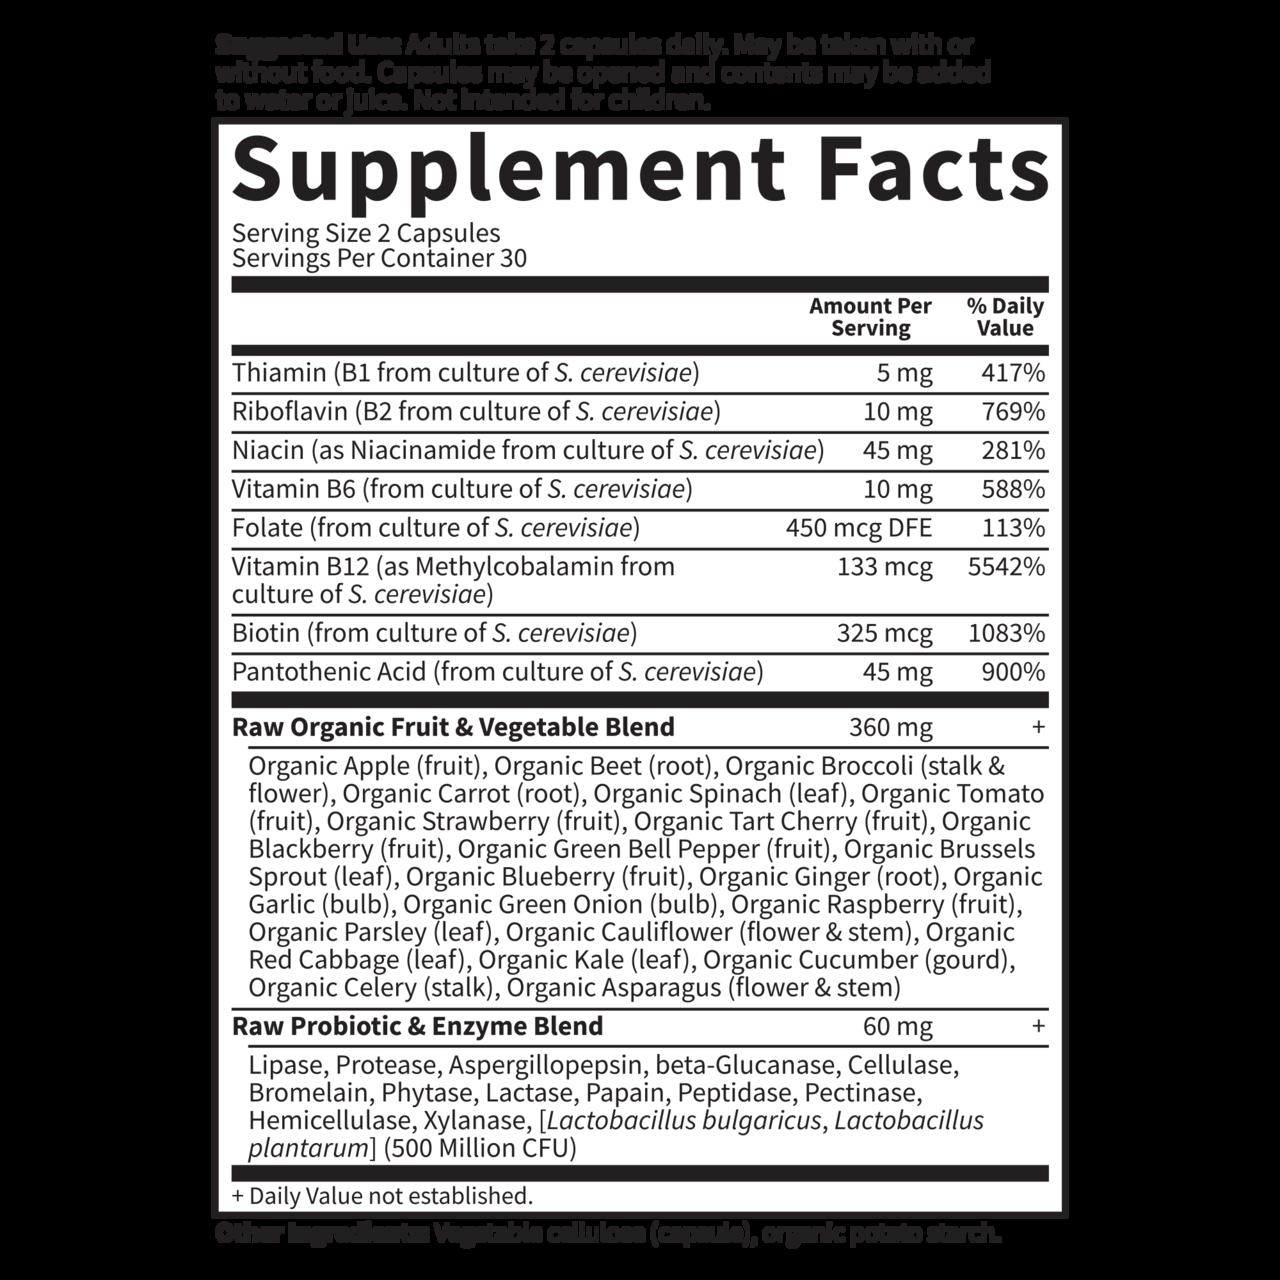 Garden of Life Raw B-Complex Supplement Facts